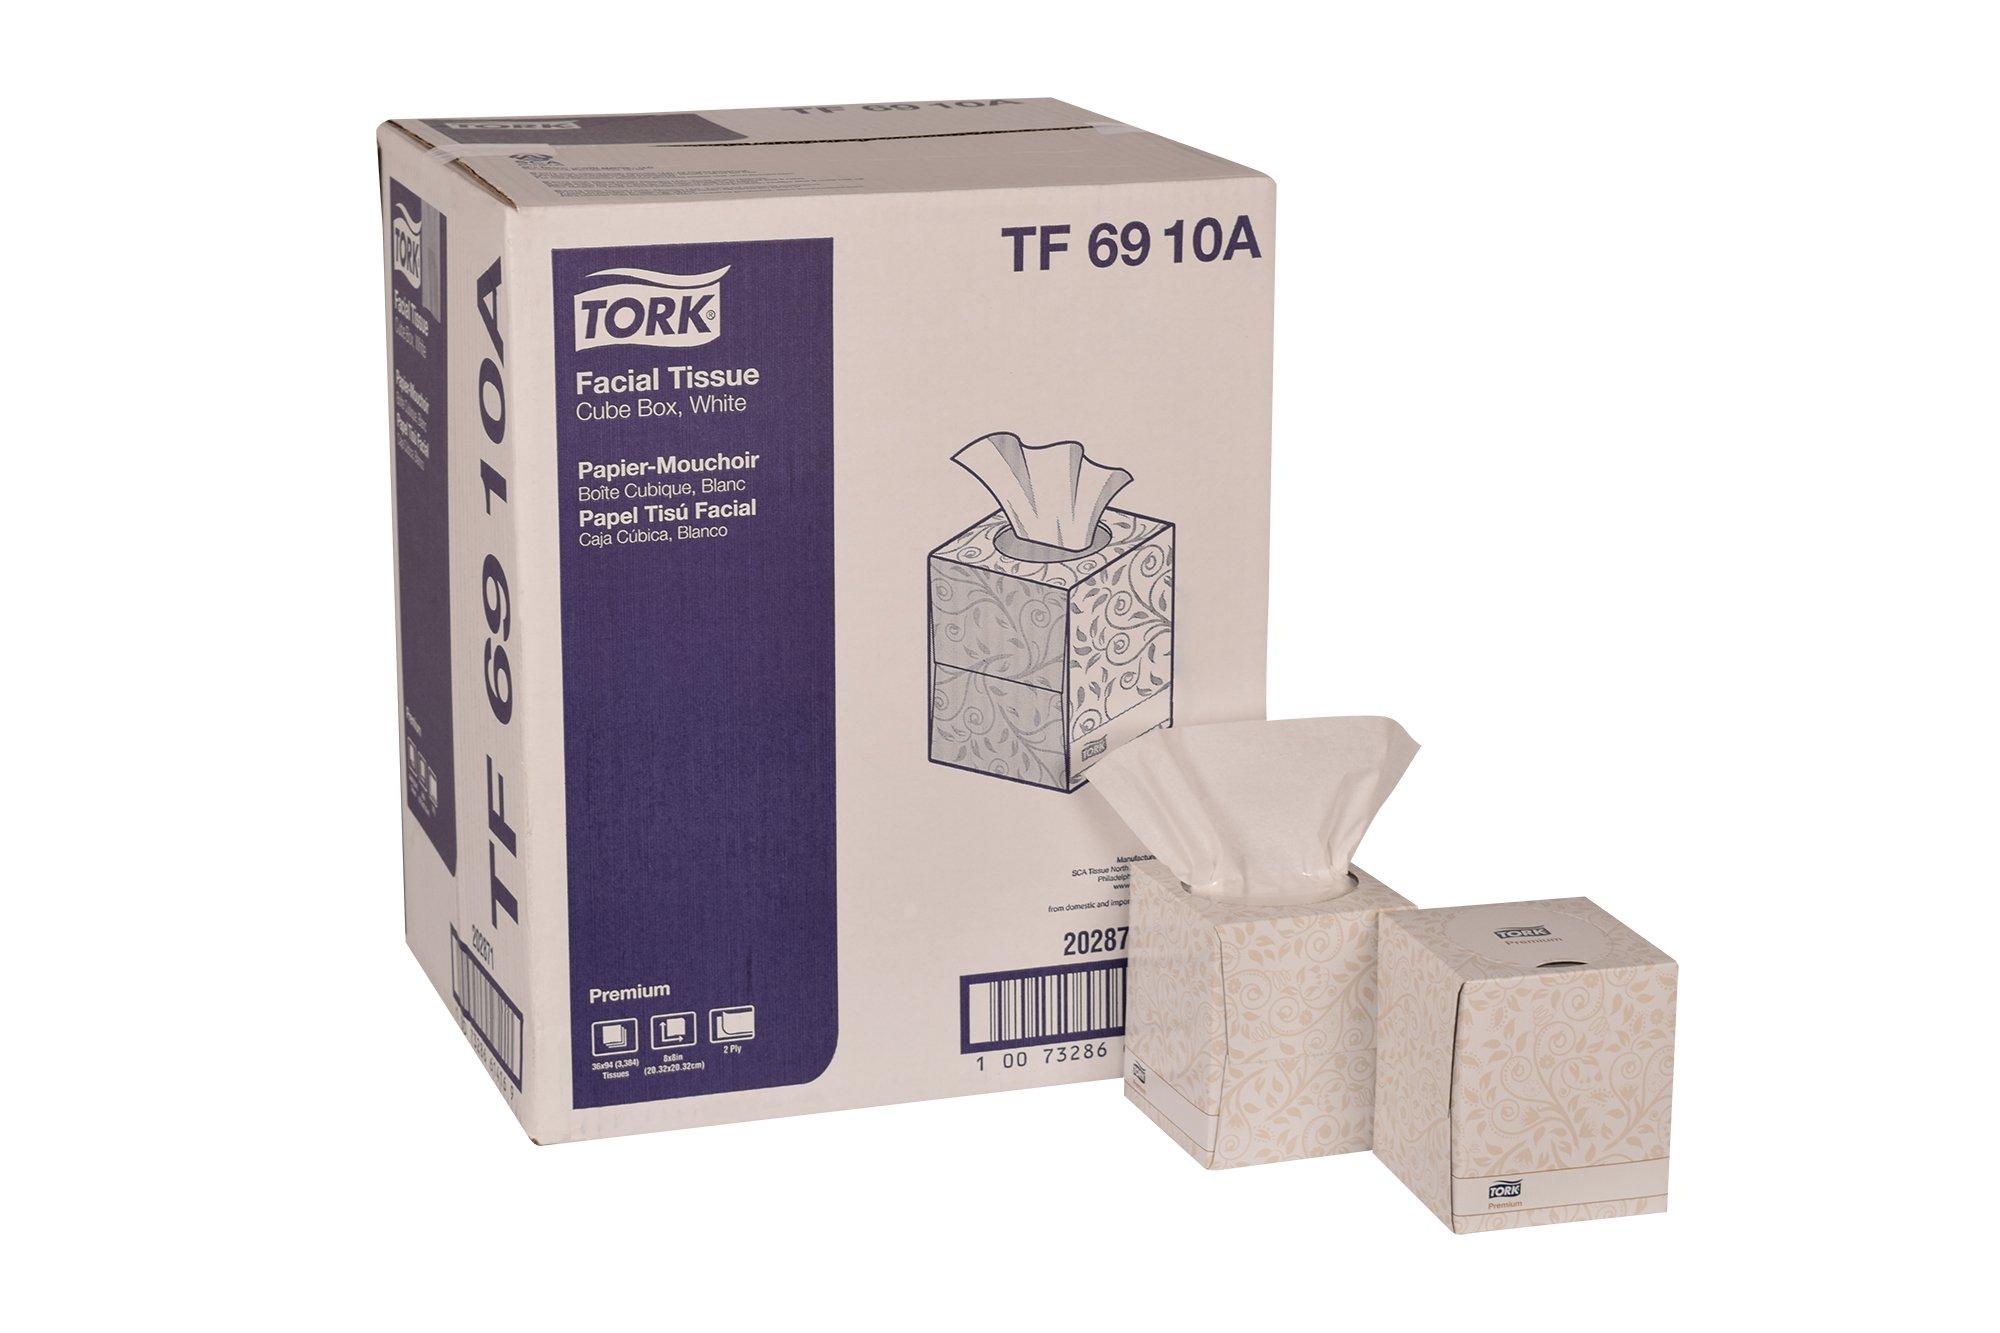 "Tork Premium TF6910A Facial Tissue, Cube Box, 2-Ply, 8.0"" Width x 8.0"" Length, White (Case of 36 Boxes, 94 per Box, 3,384 Sheets)"